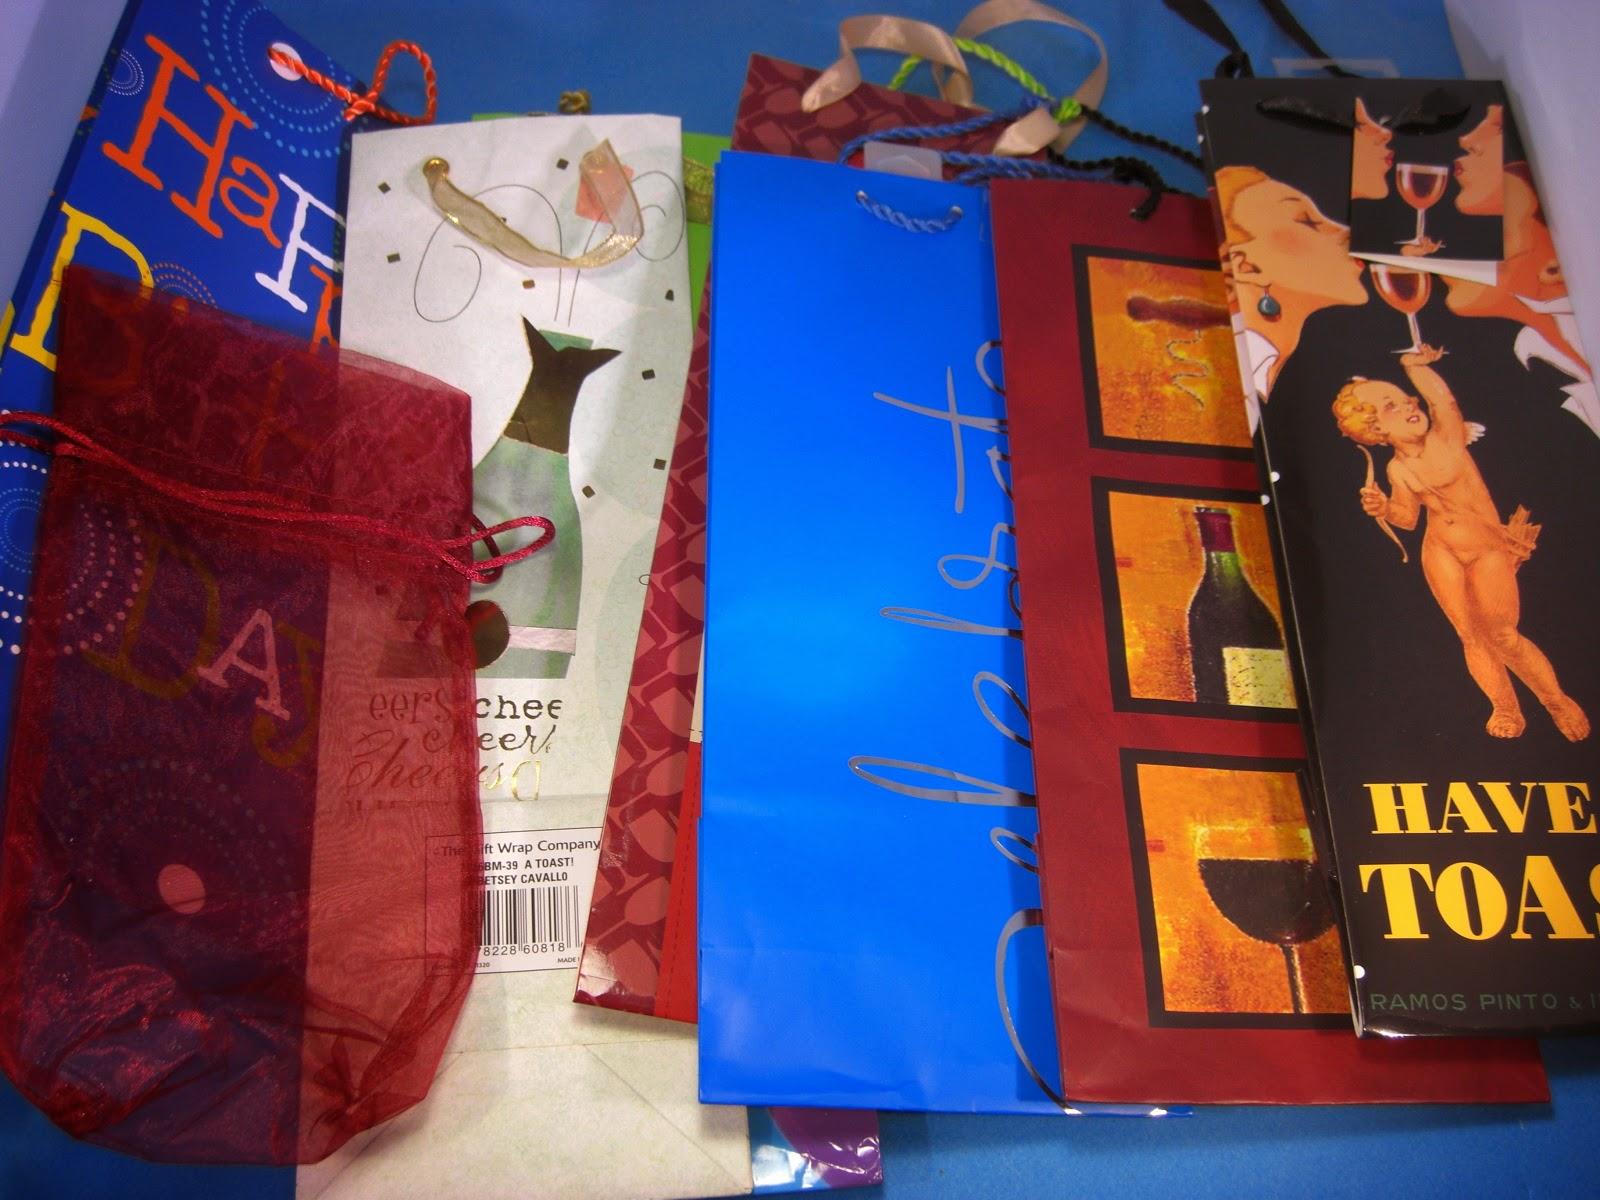 http://bargaincart.ecrater.com/p/17654336/lot-of-10-fancy-gift-bags-wine